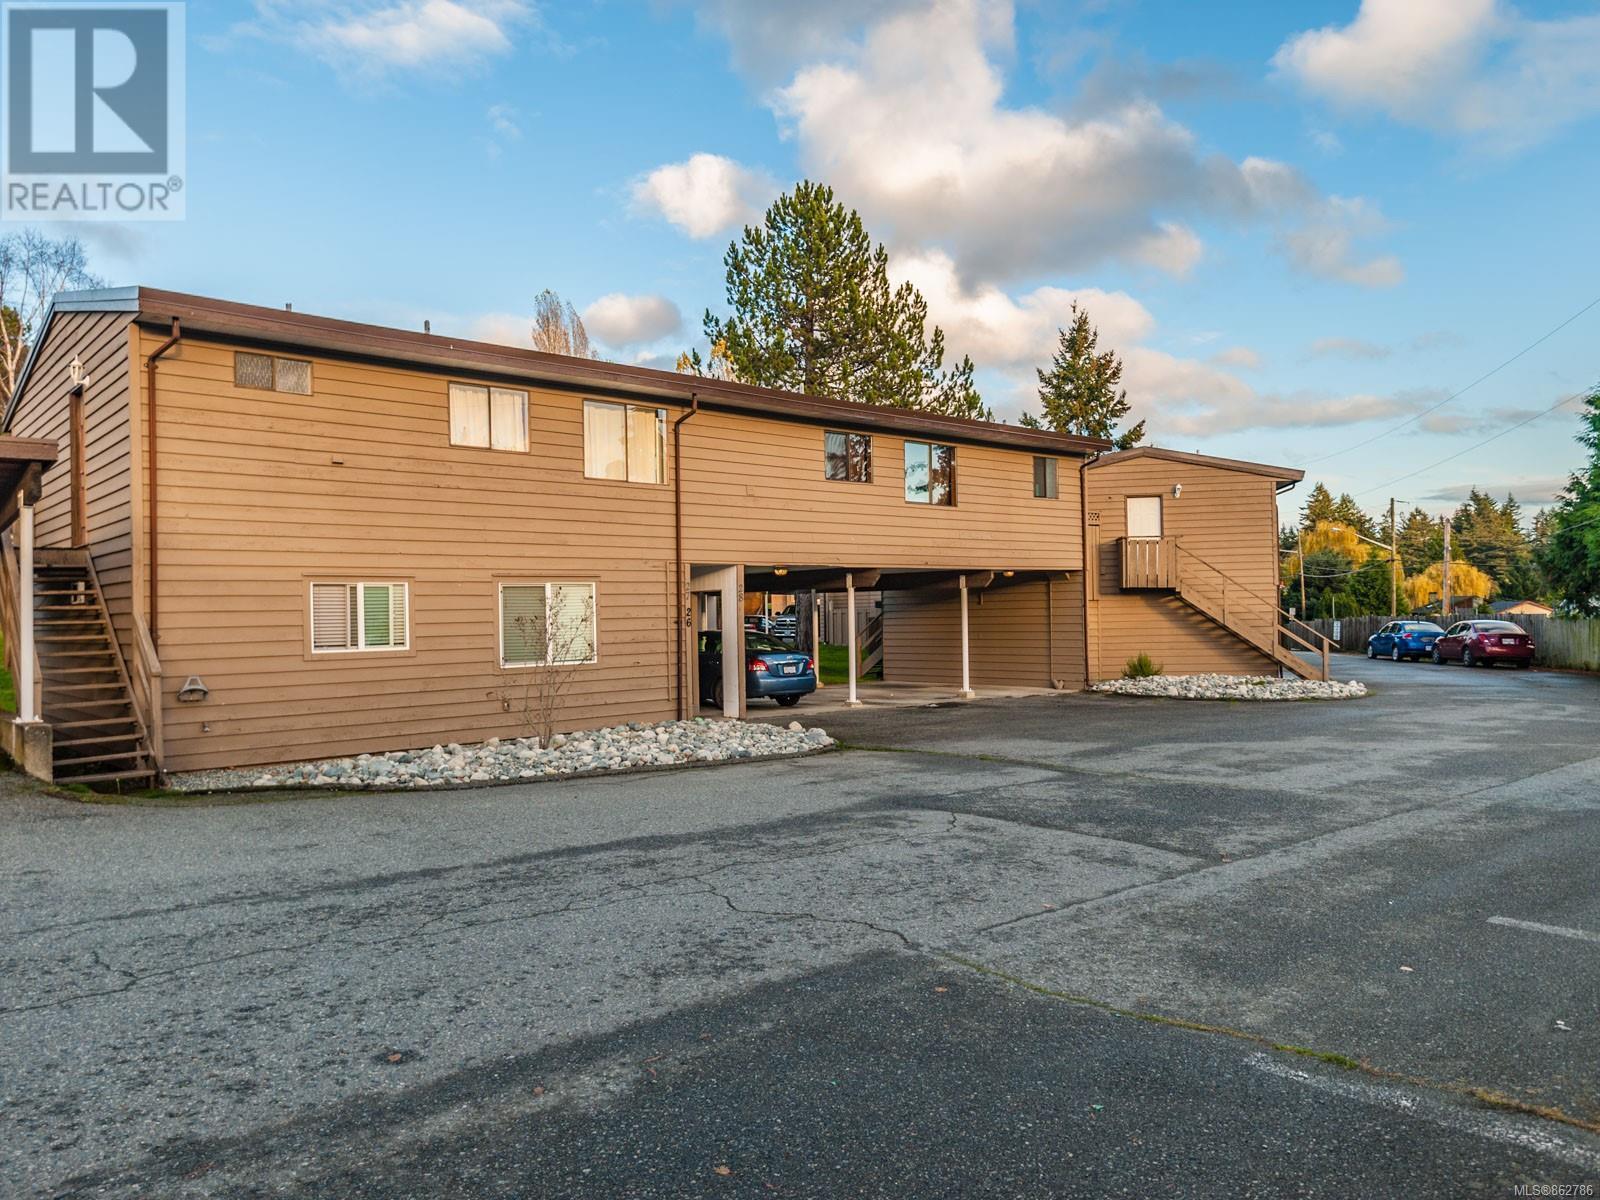 31 25 Pryde Ave, Nanaimo, British Columbia  V9S 4R5 - Photo 24 - 862786